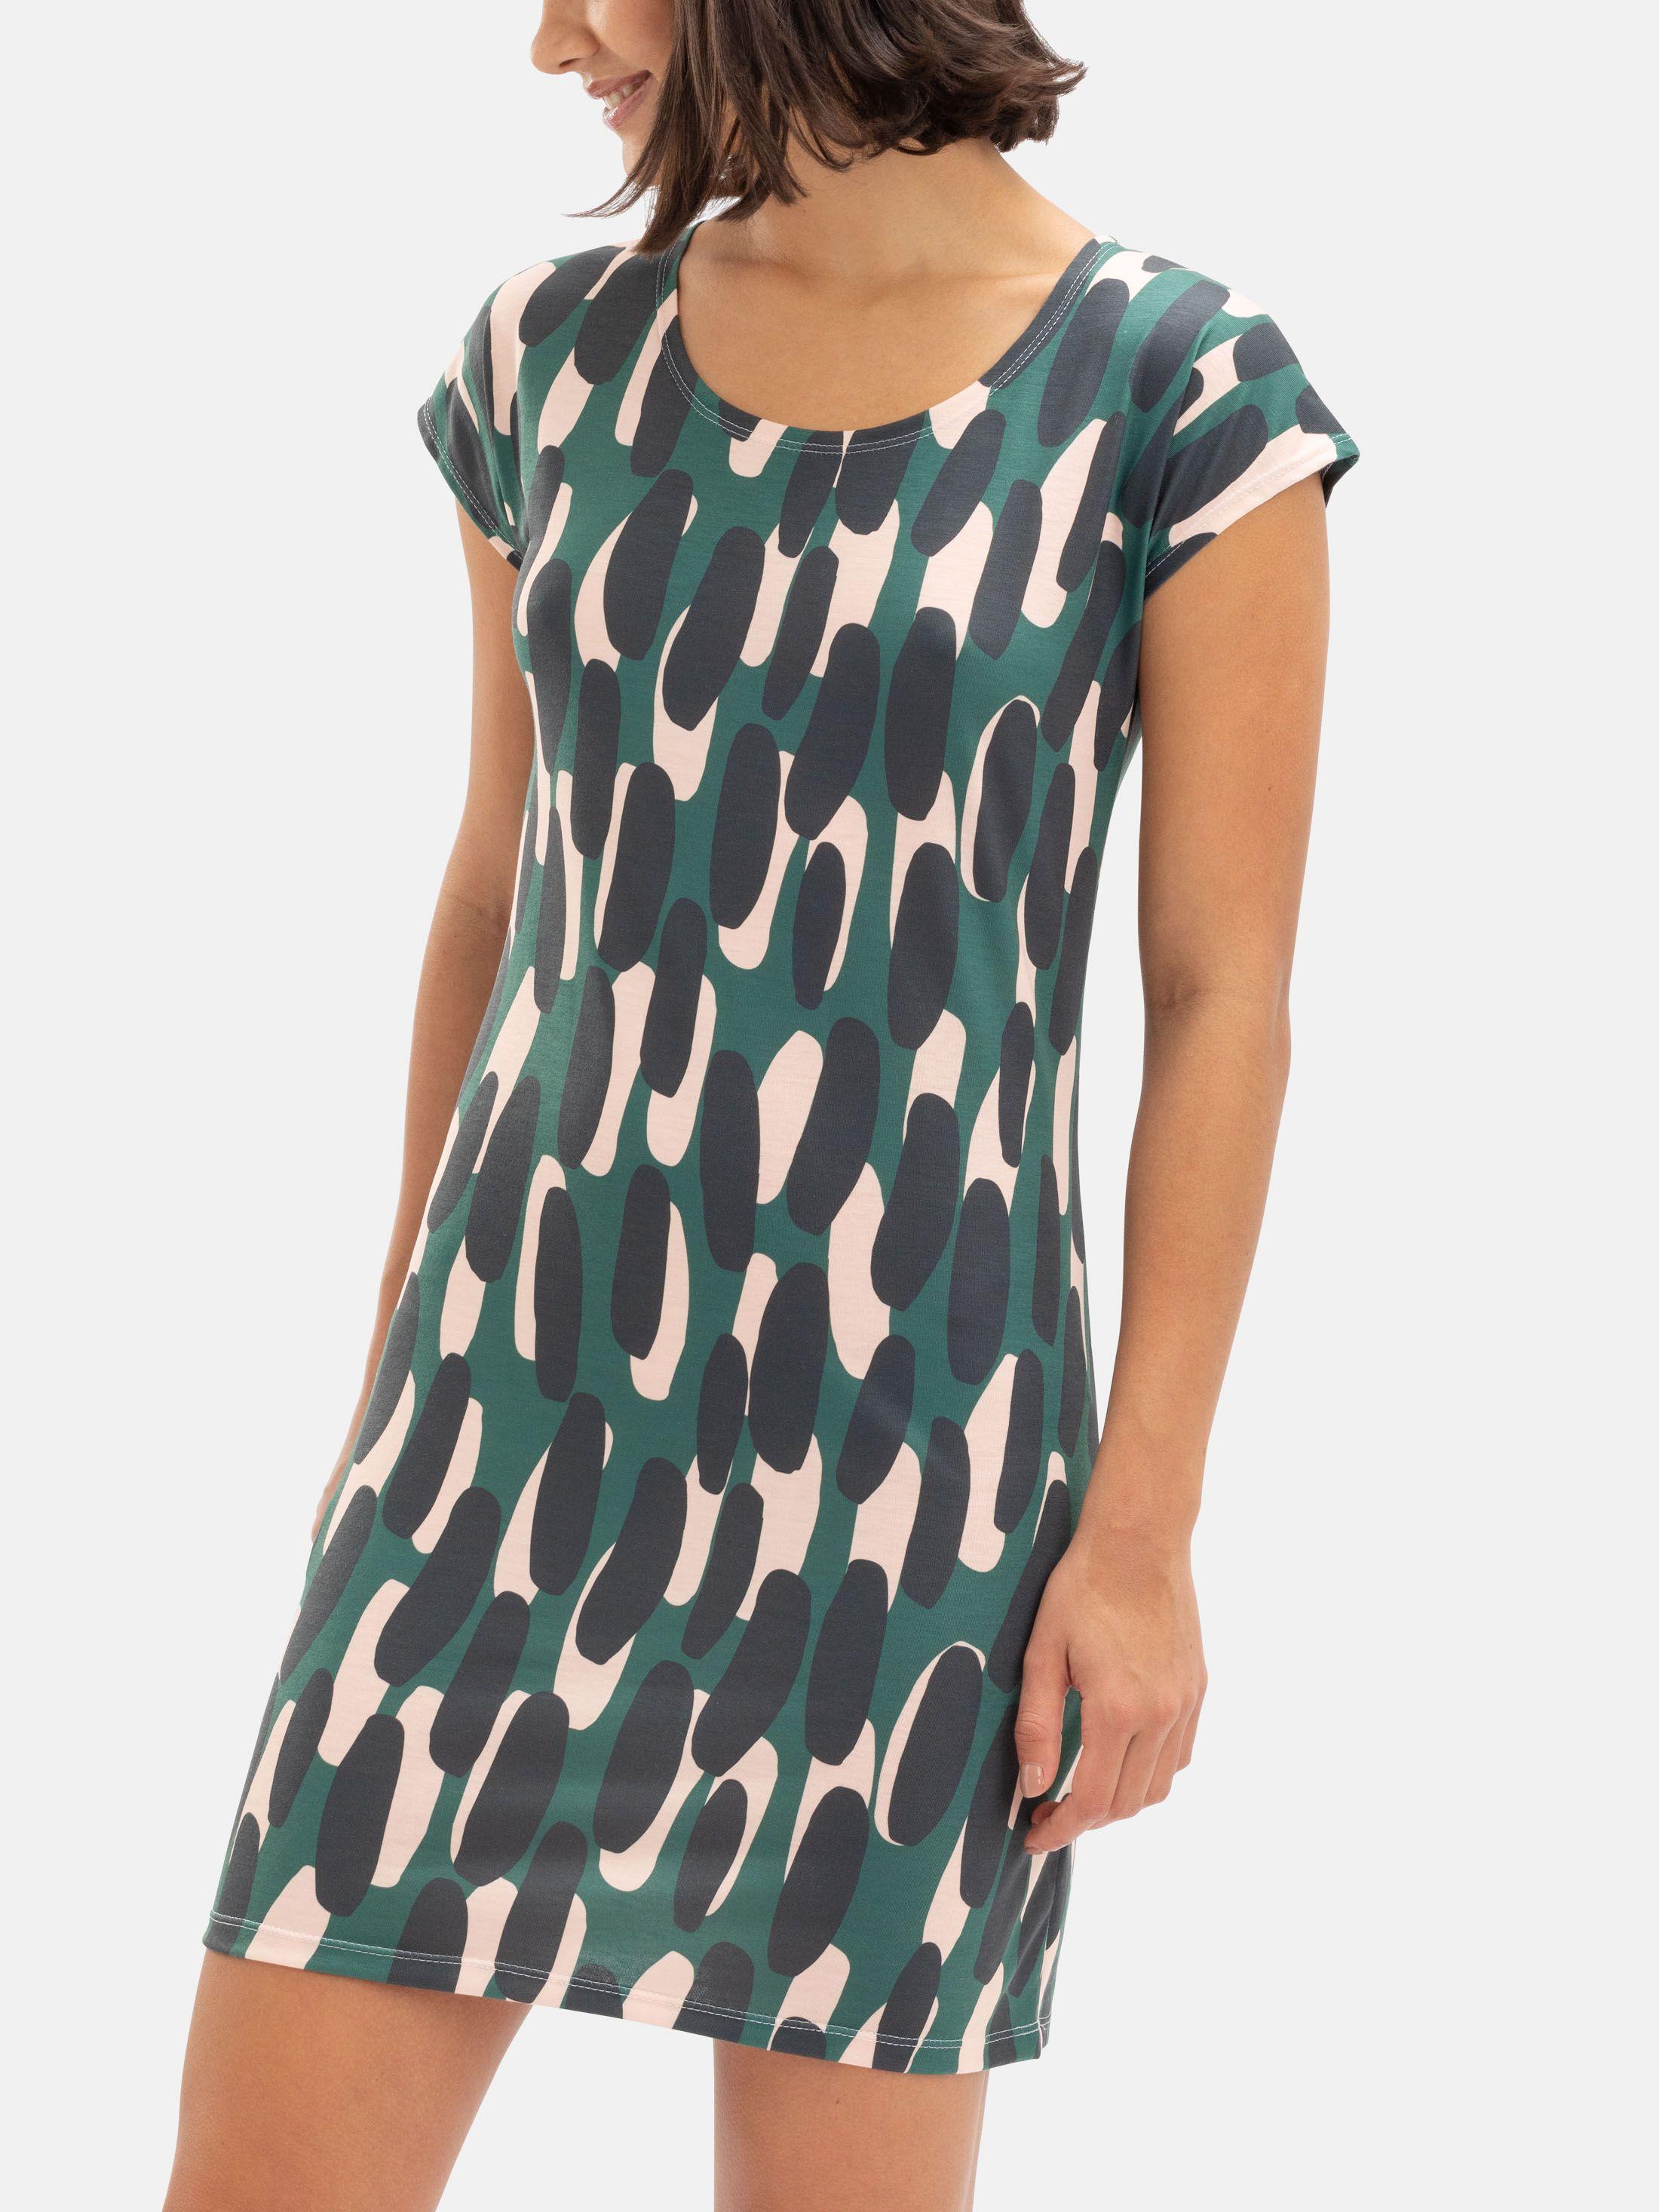 Make your own T-Shirt Dress